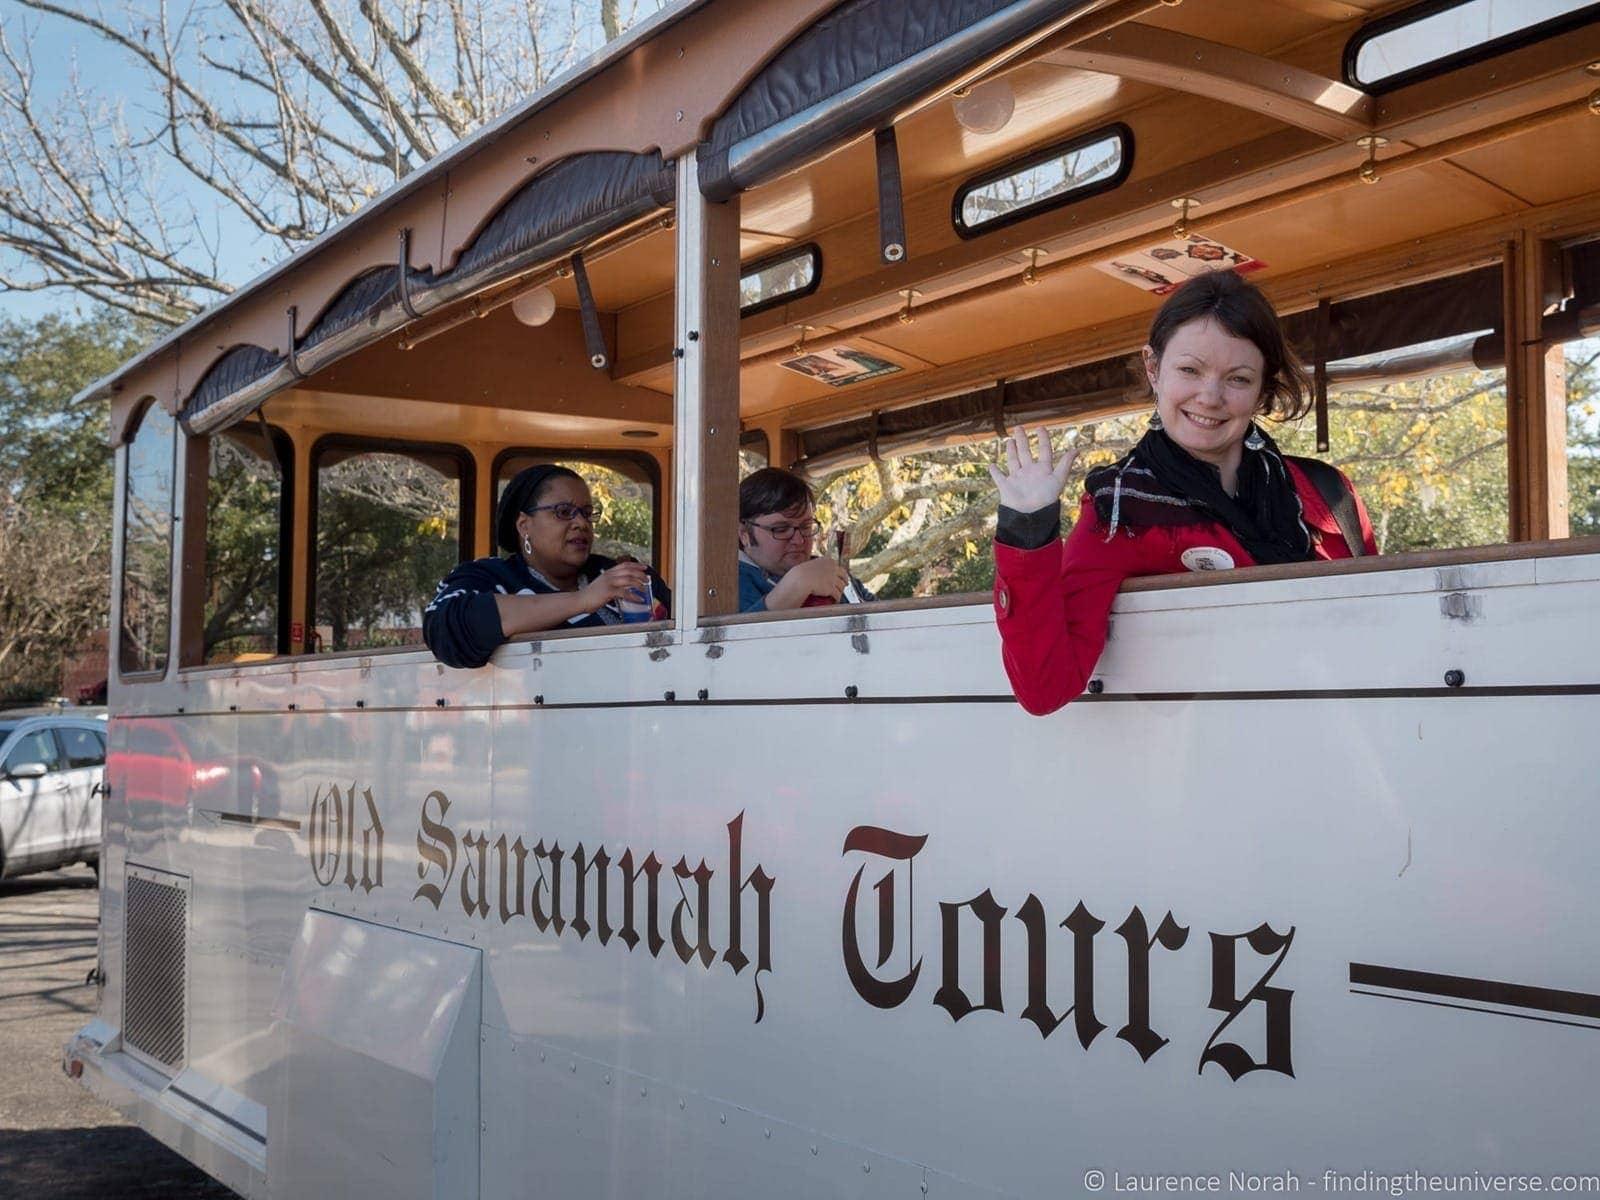 Old Savannah Tours Trolley Car